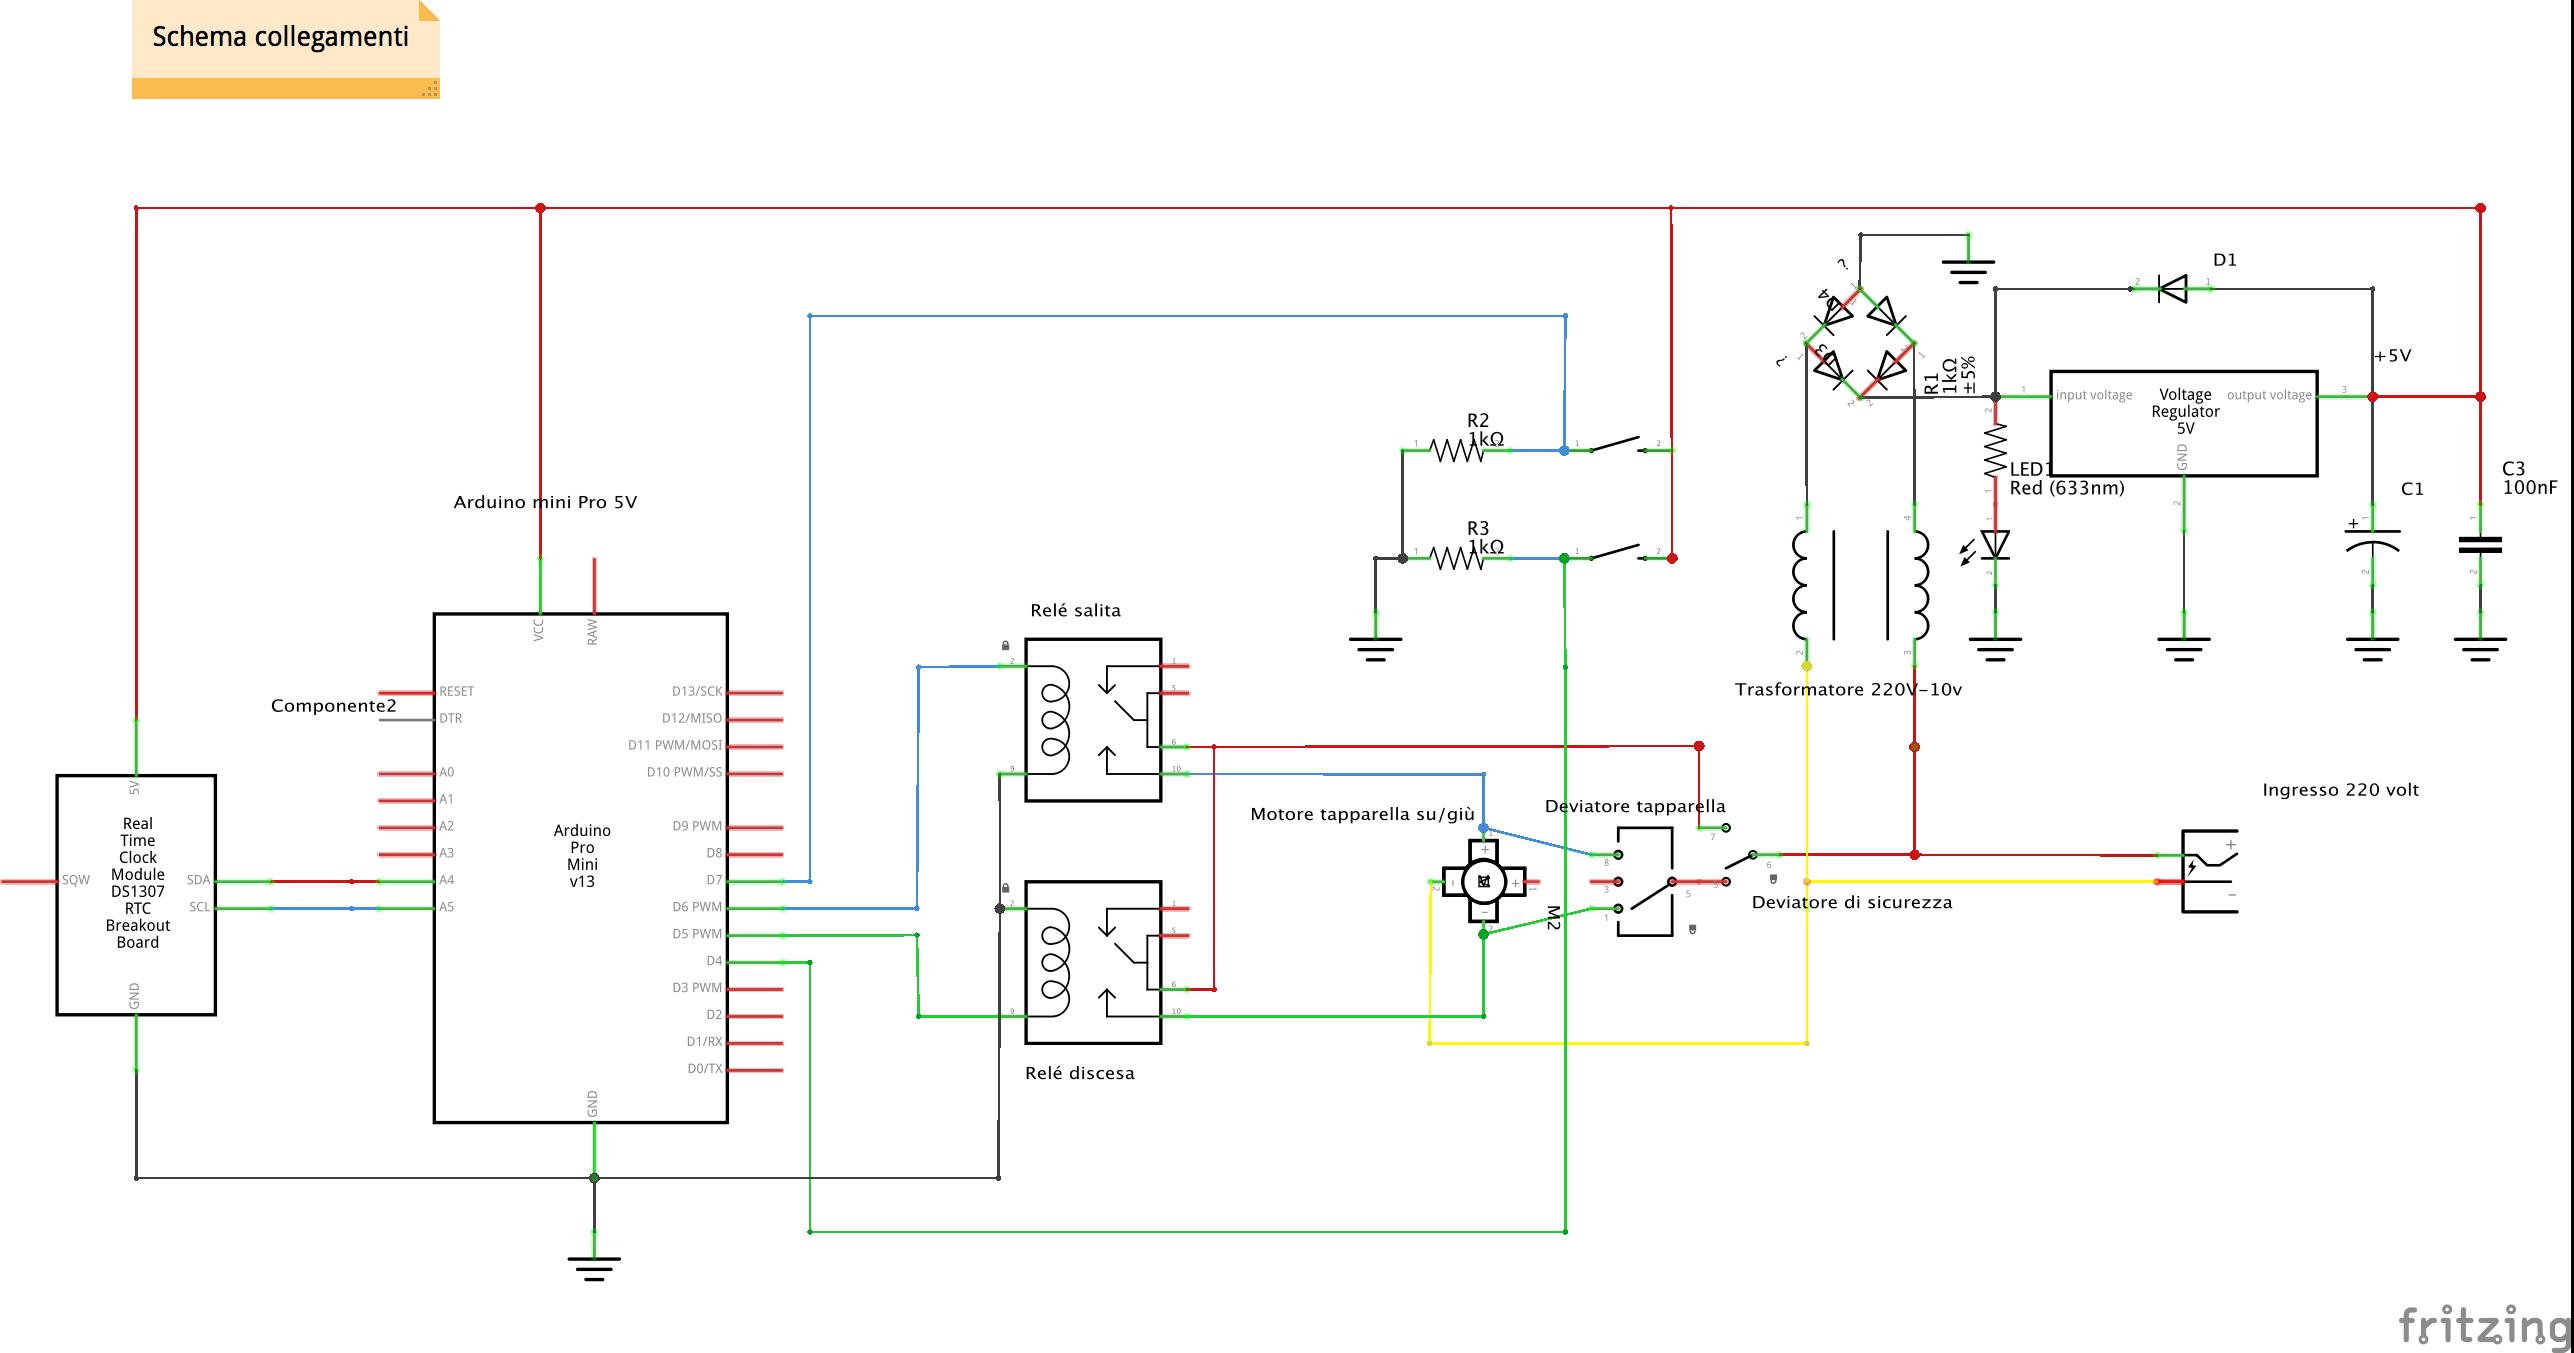 Schema Elettrico Per Yard : Schema elettrico per tapparelle